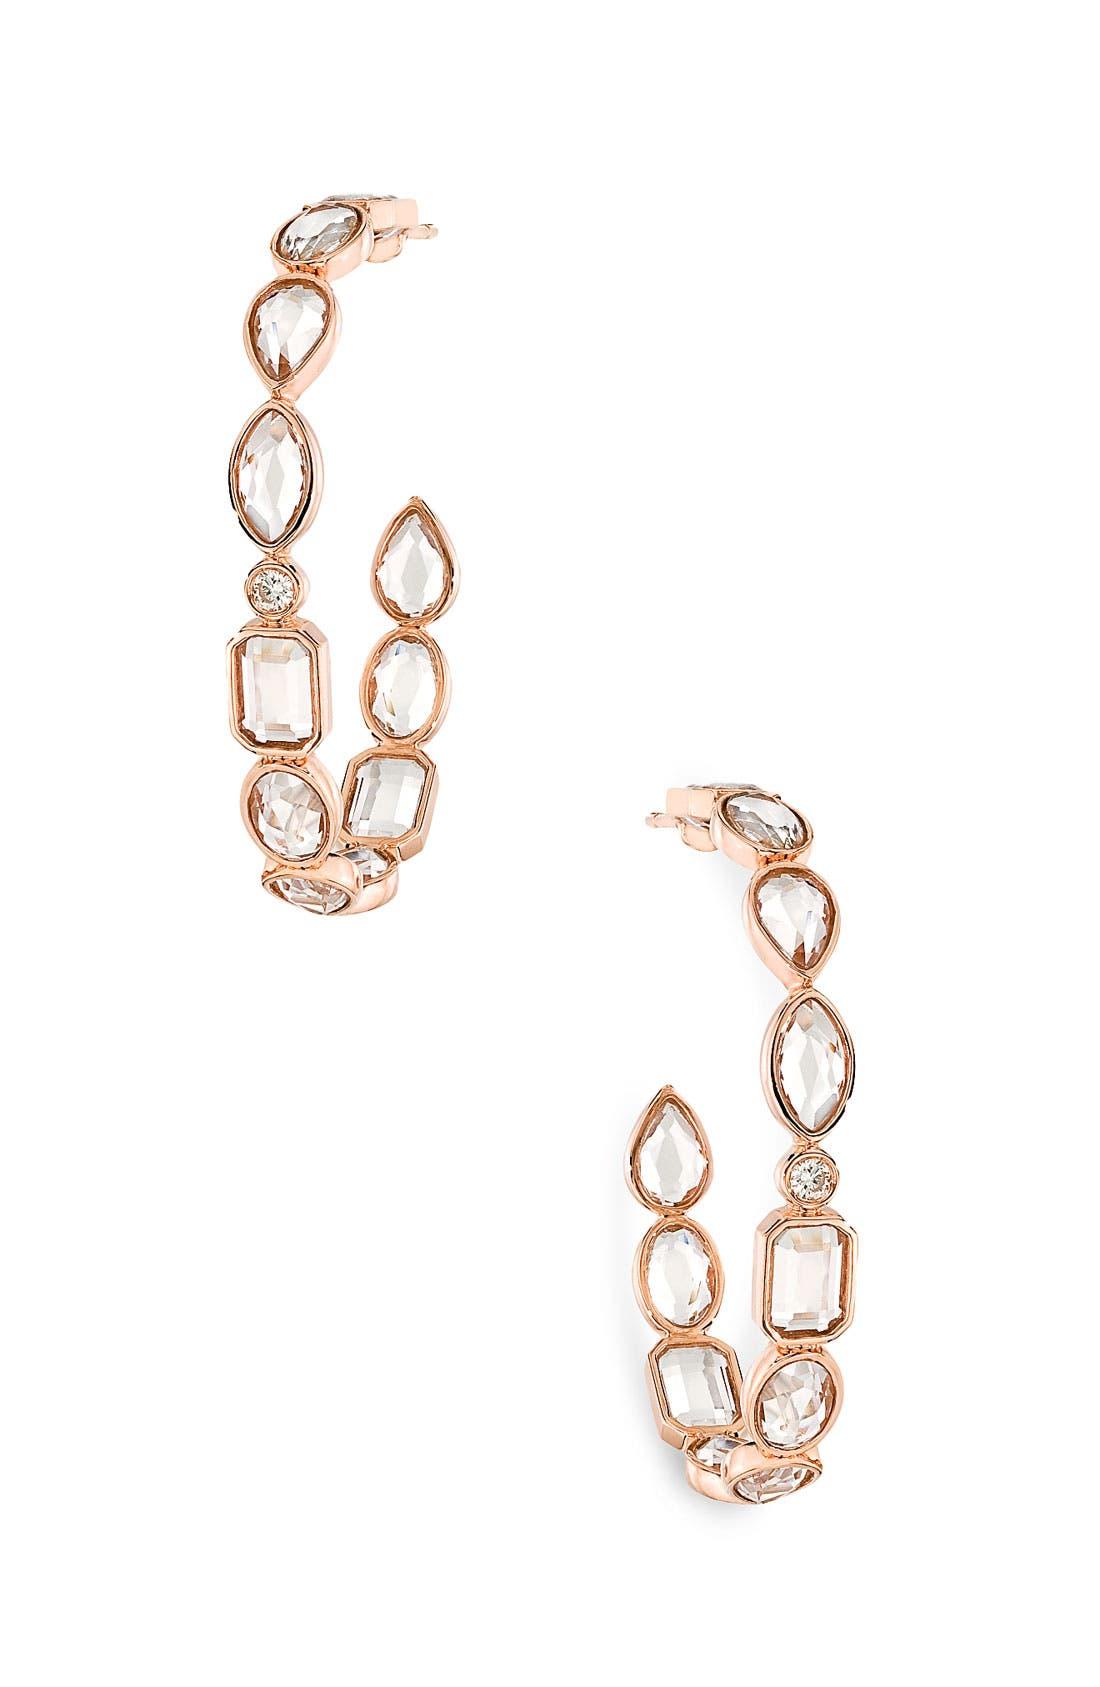 Alternate Image 1 Selected - Ivanka Trump 'Mixed Cut' Small Rock Crystal & Diamond Hoop Earrings